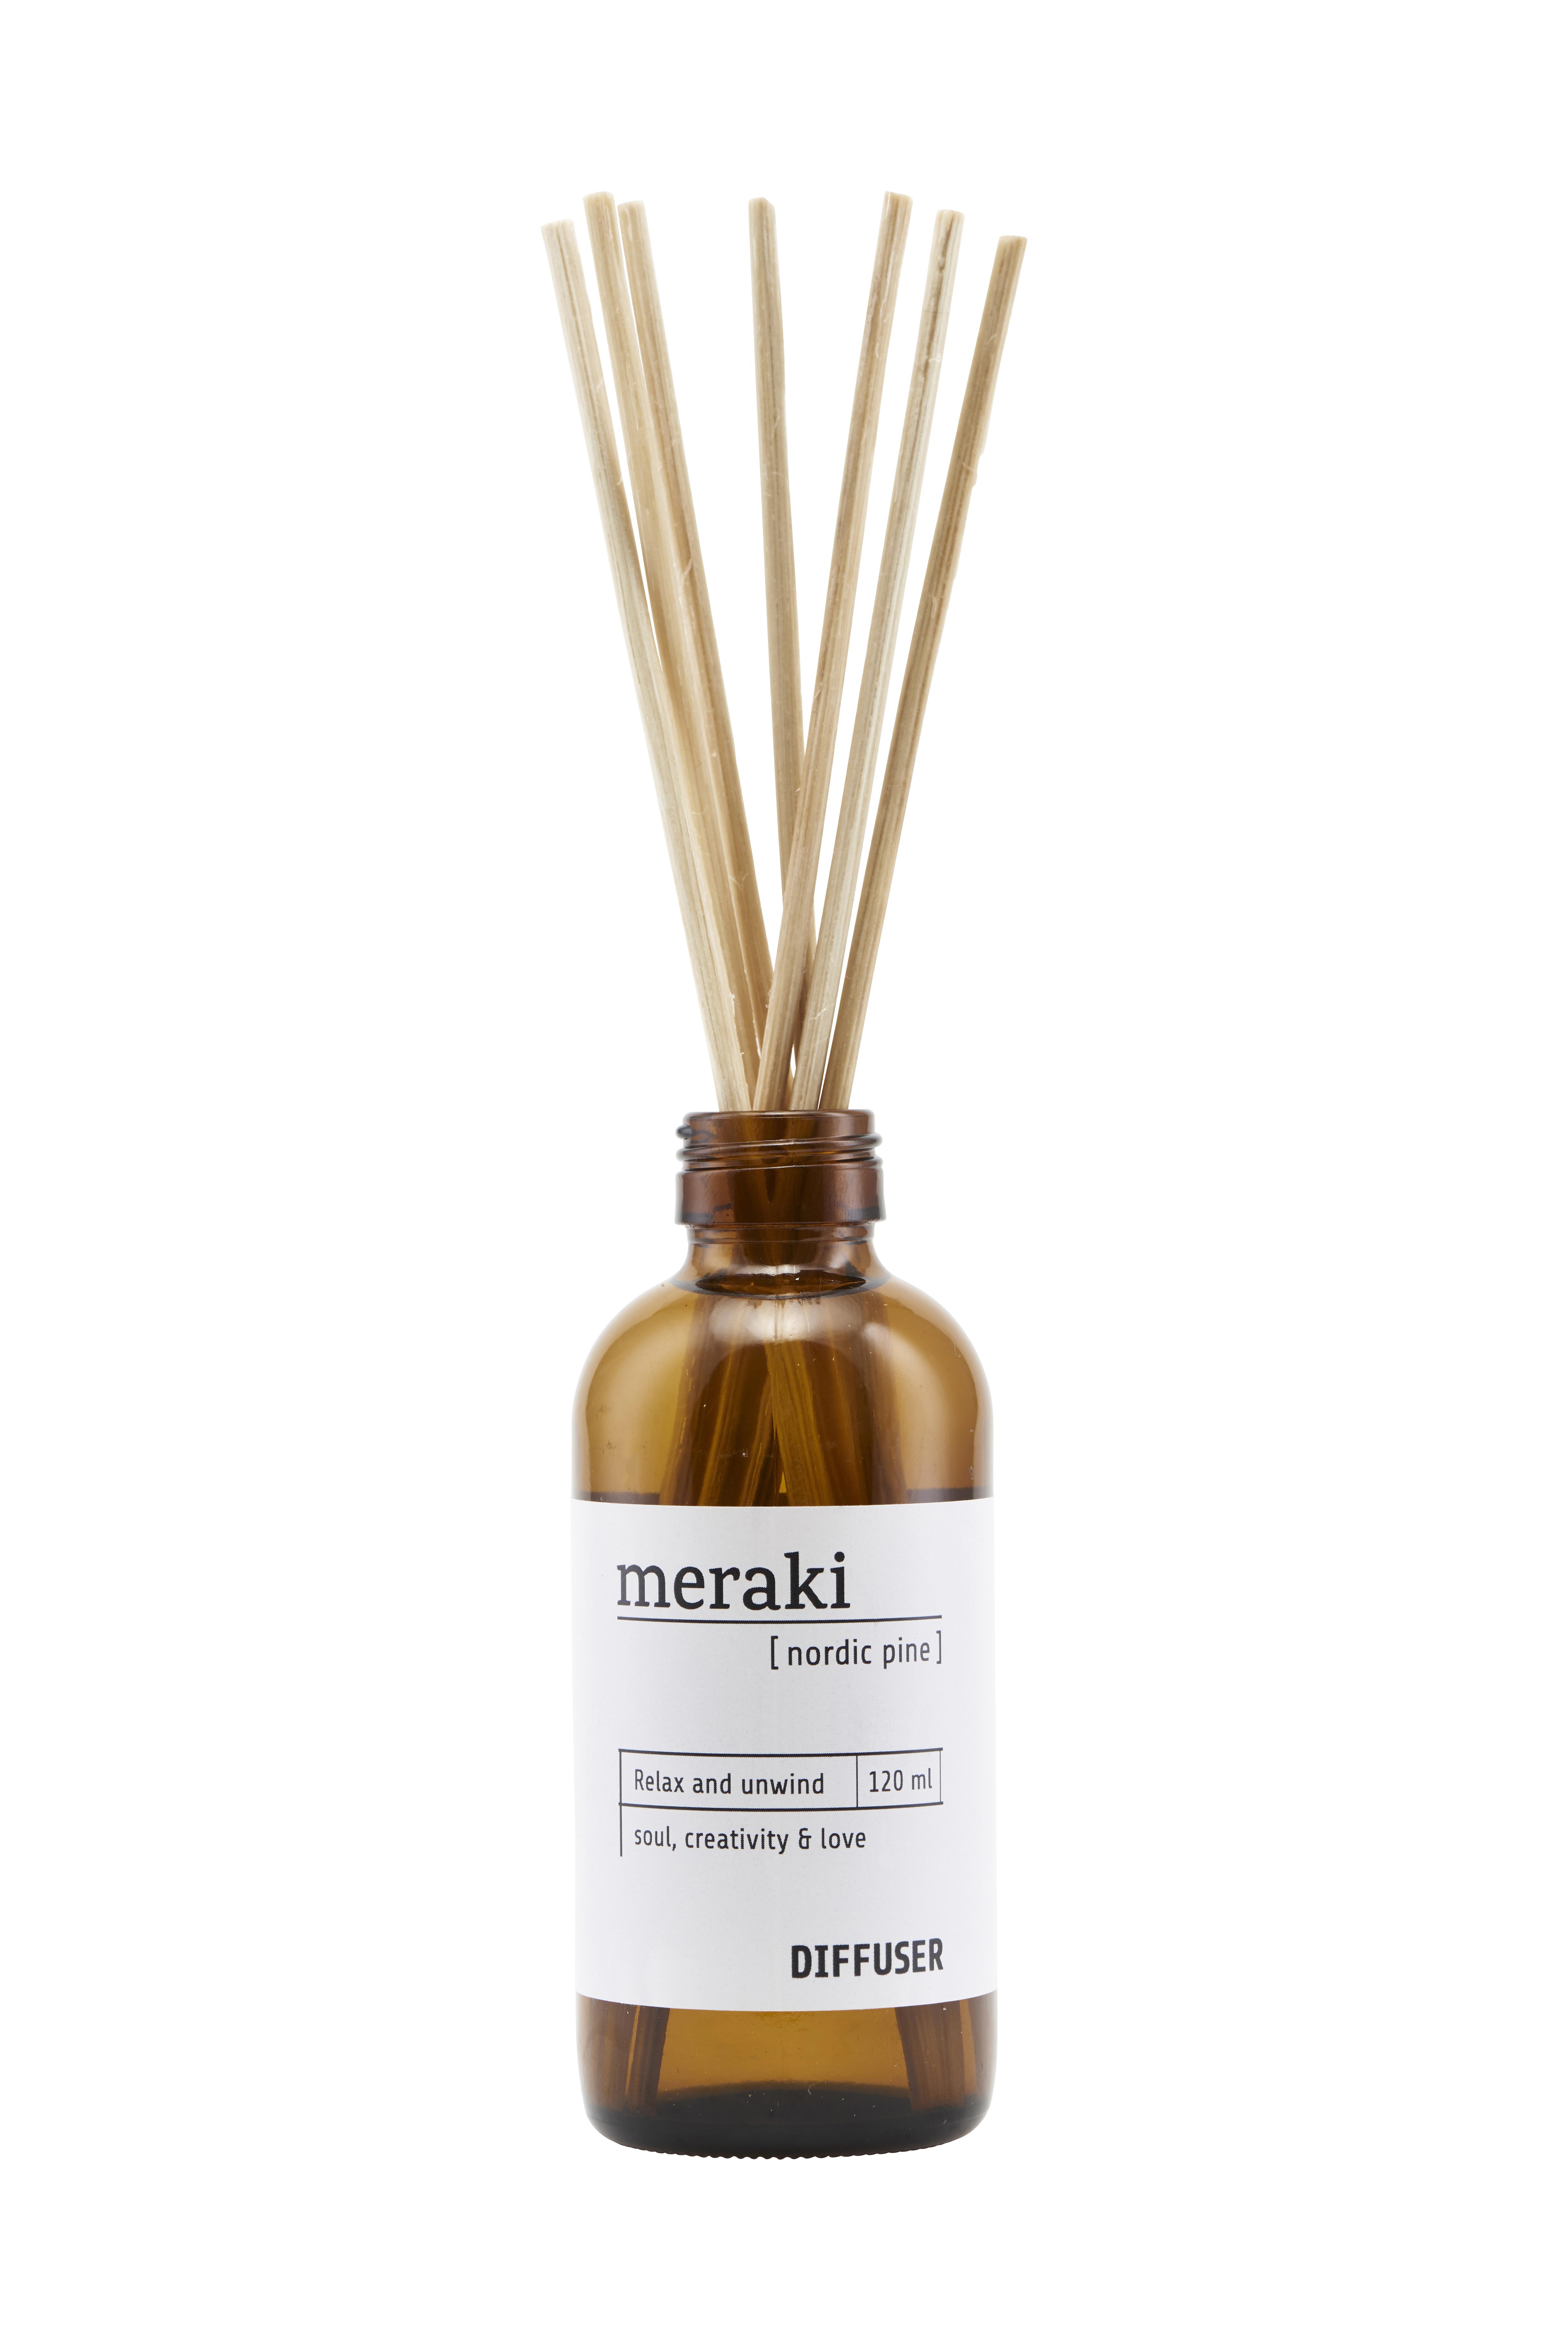 Meraki Nordic Pine Diffuser, 120 ml